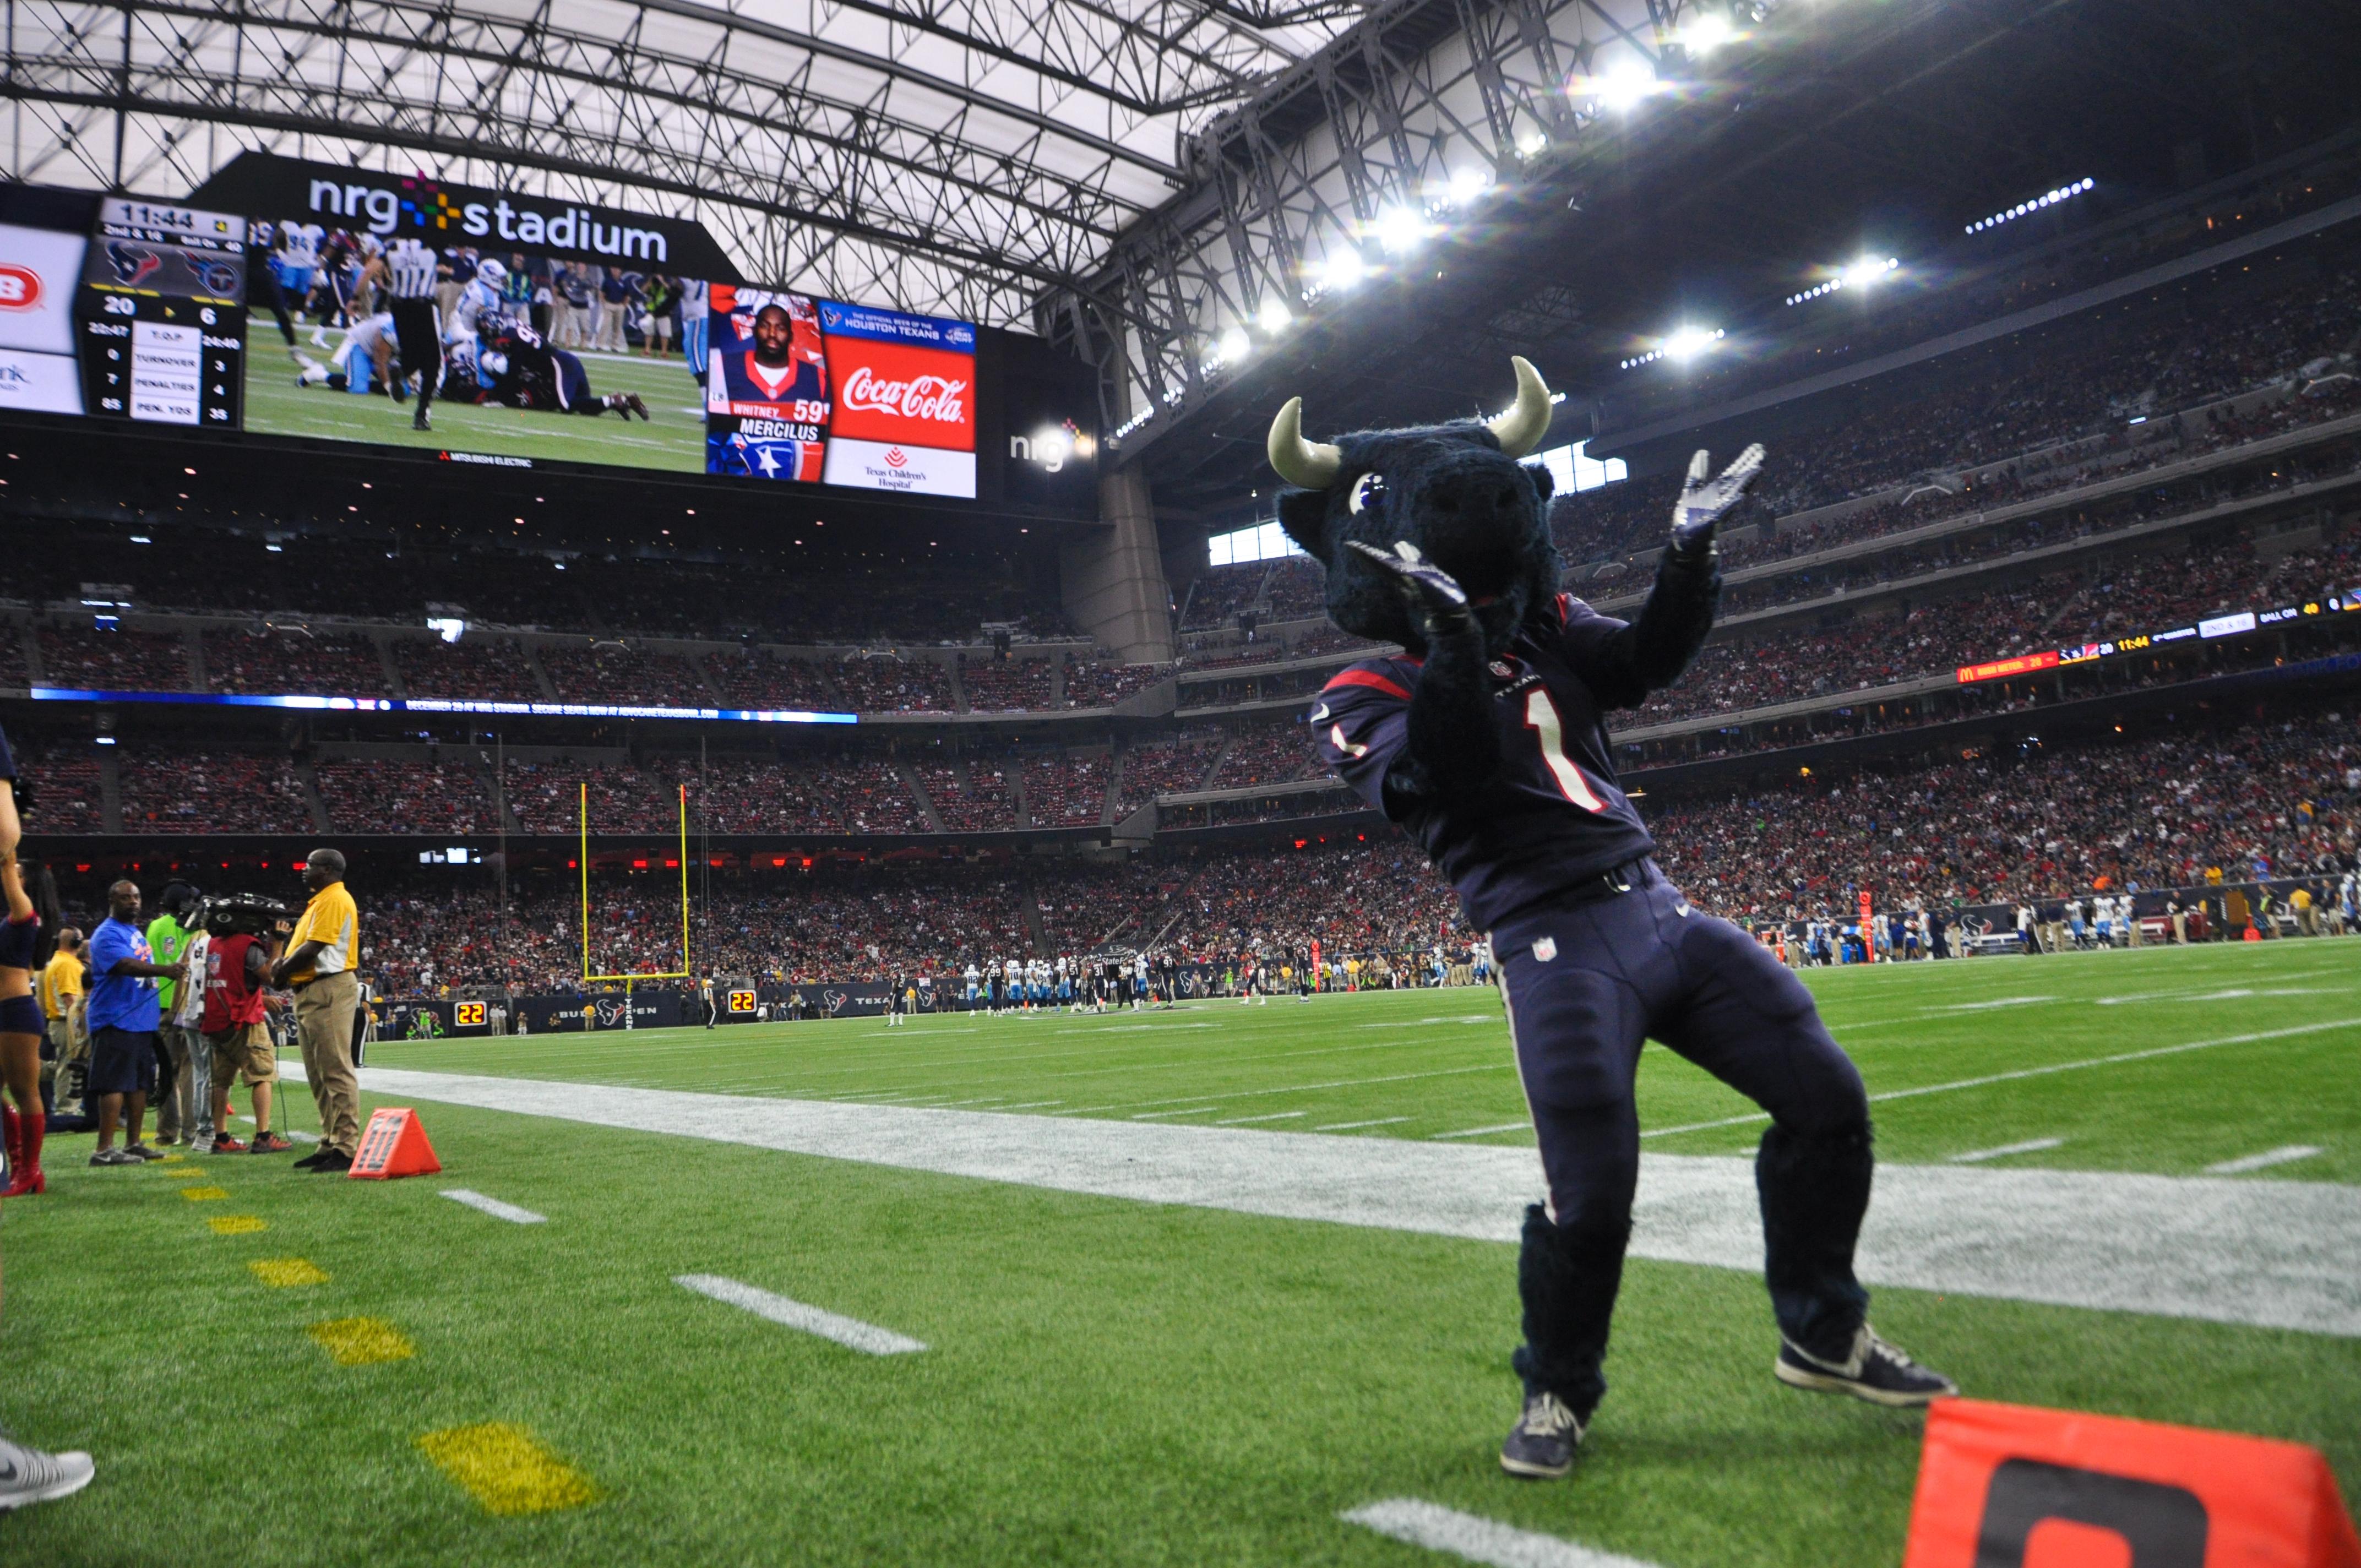 d8a6c835 The Texans Experience in Houston | NRG Stadium & Football